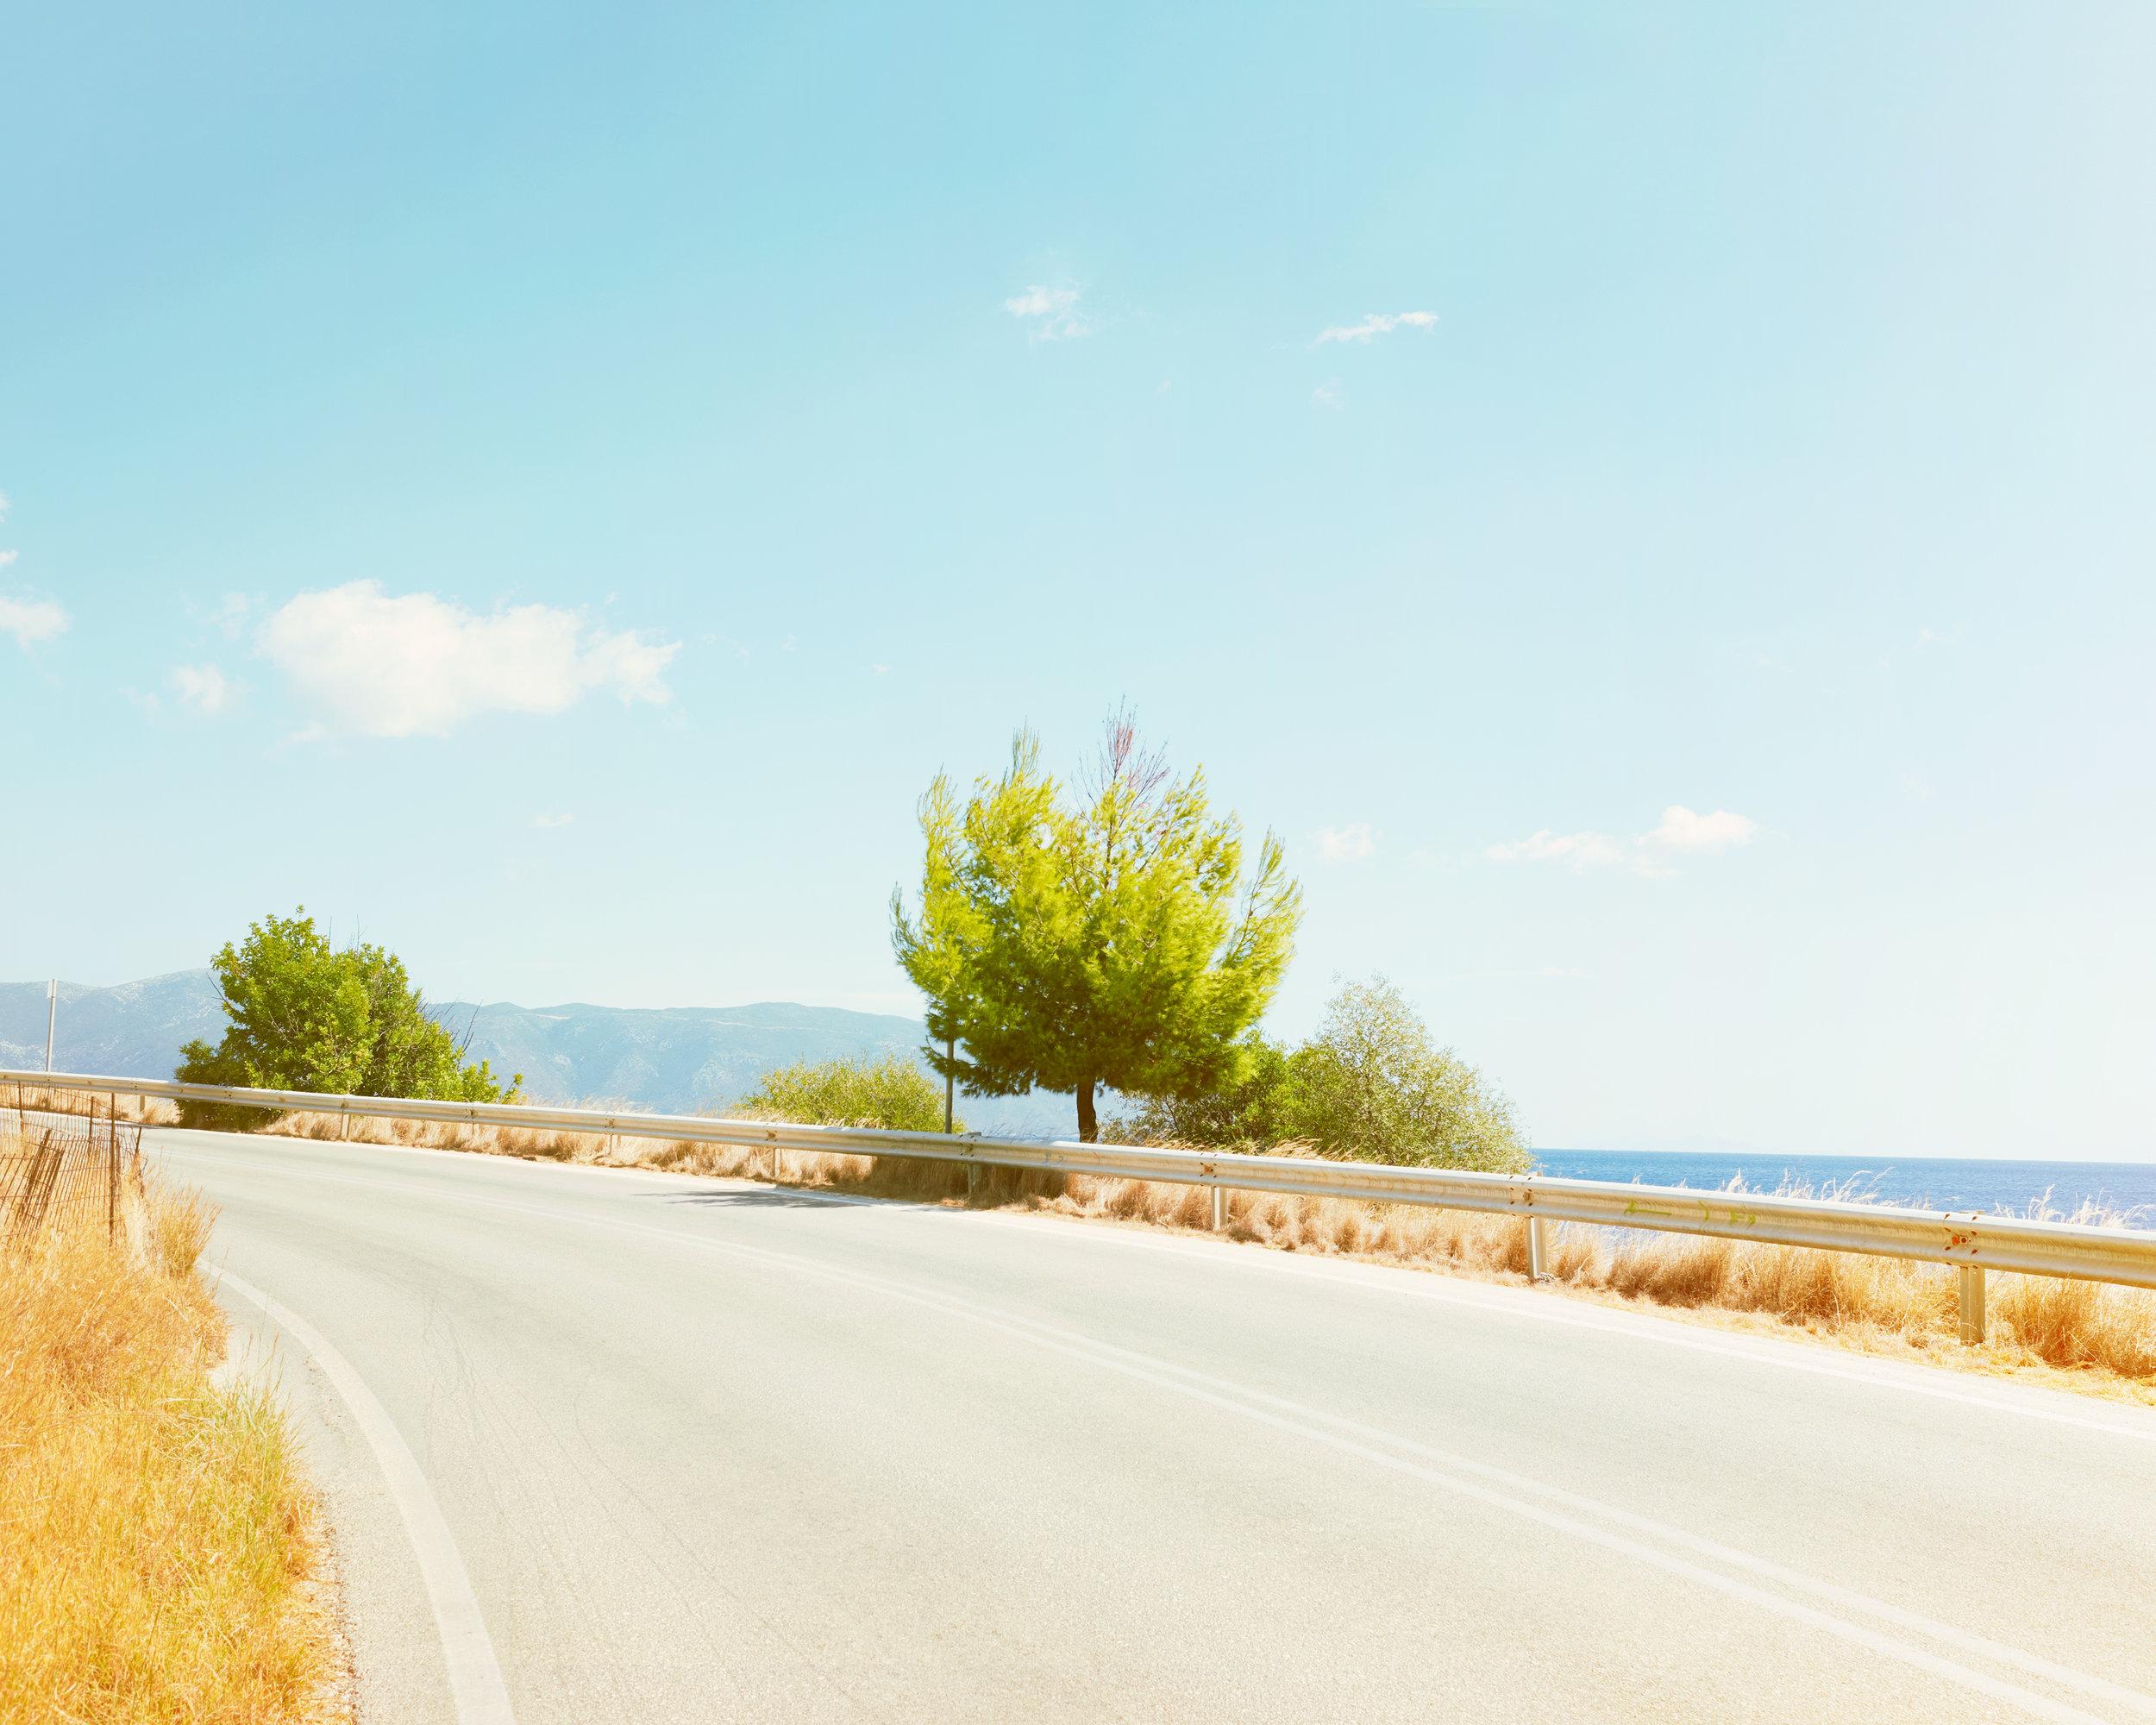 Roadside no. 1.jpg